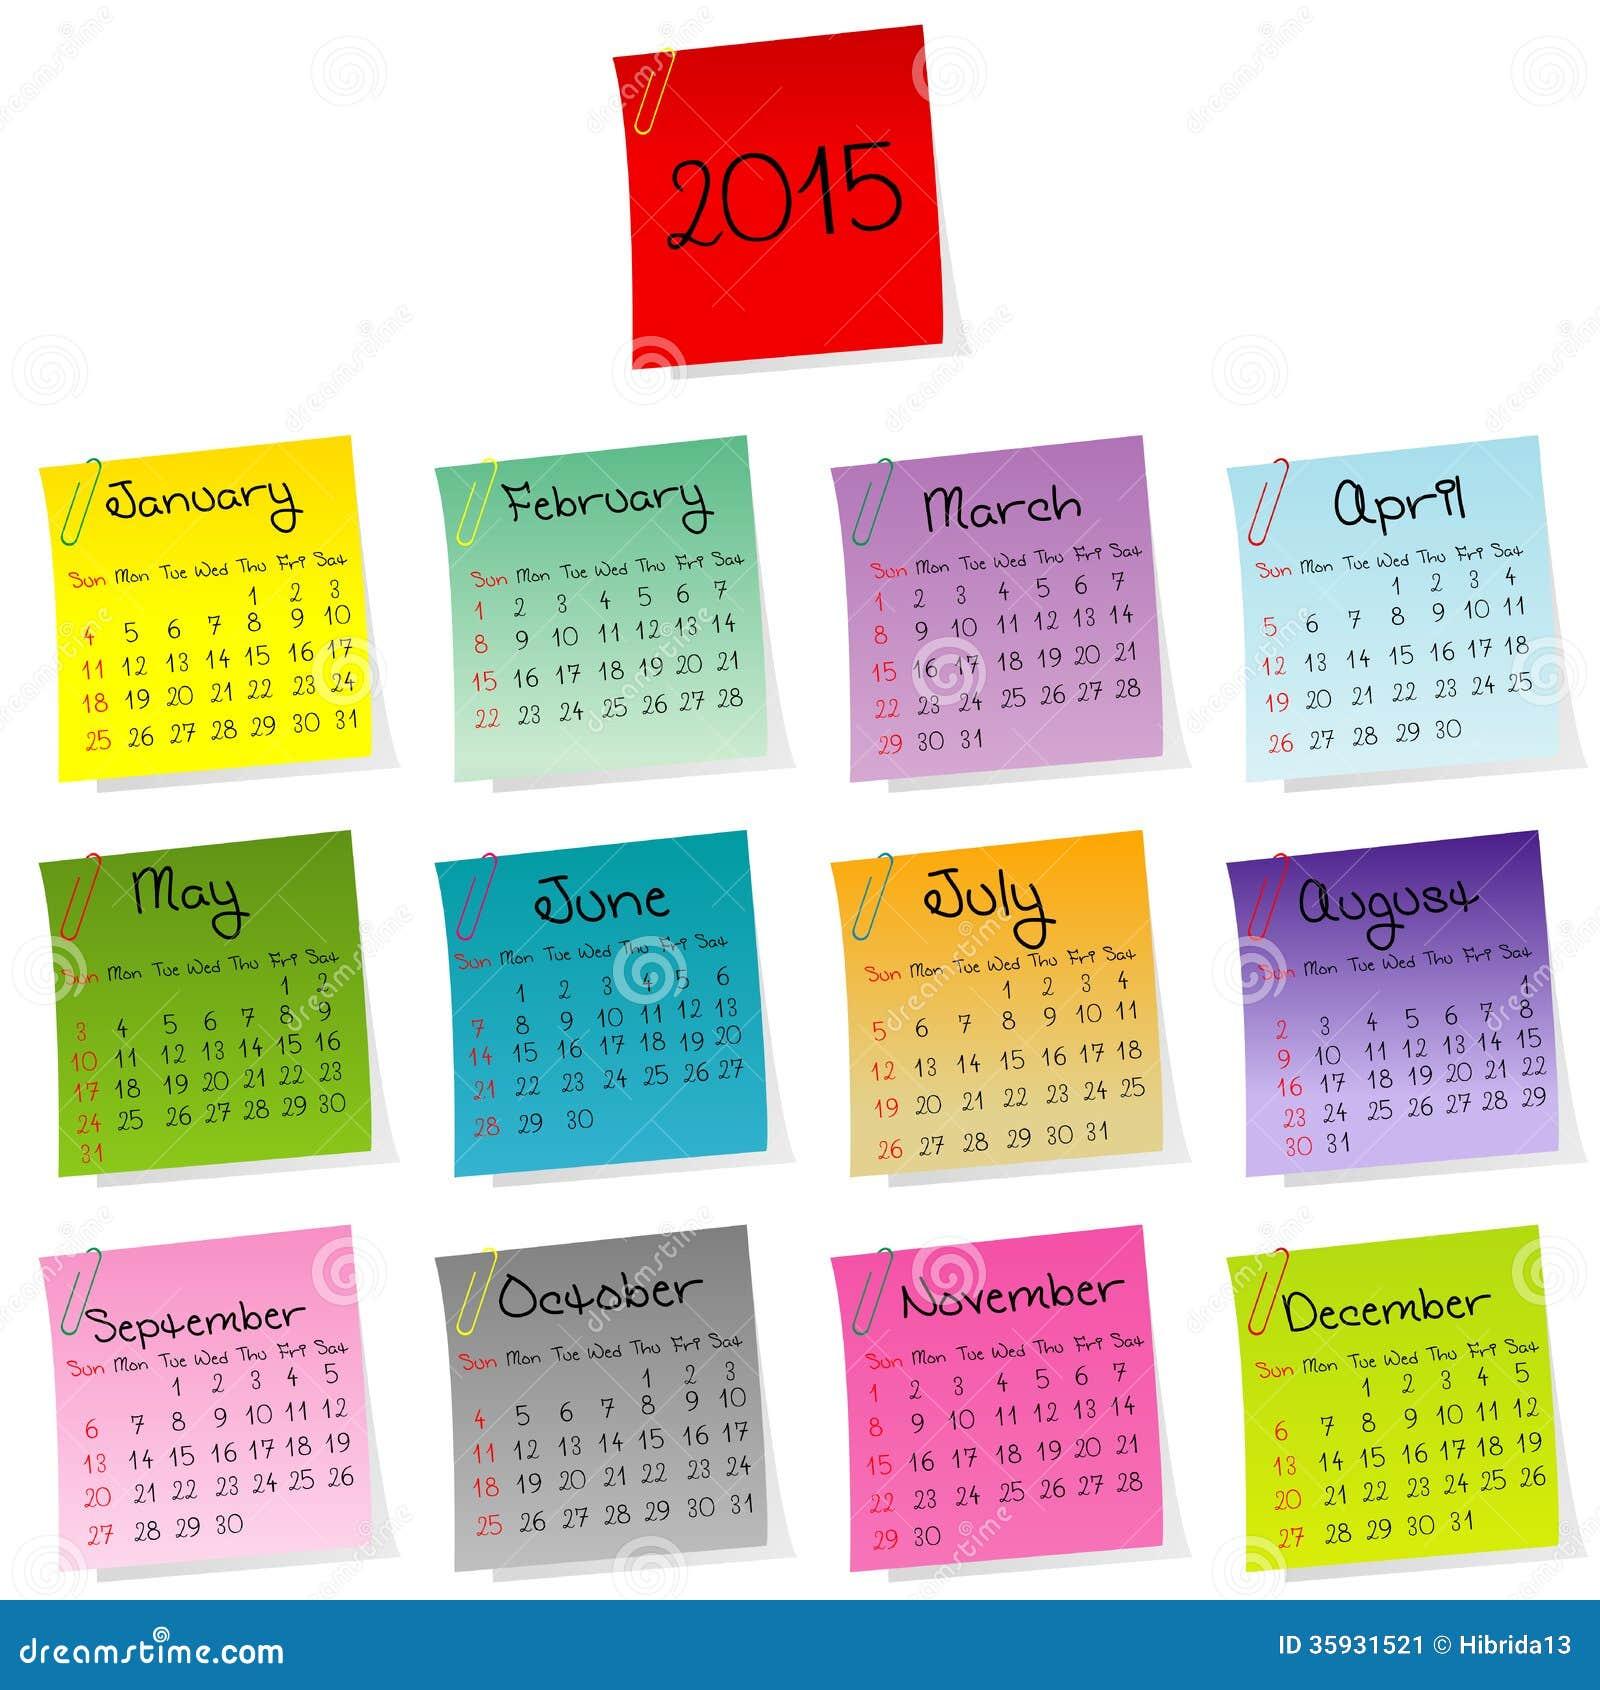 2015 calendar made of colored sheets of paper.  Размеры и лицензии фотографий Fotolia.  Цена за фото 2015 Calendar...